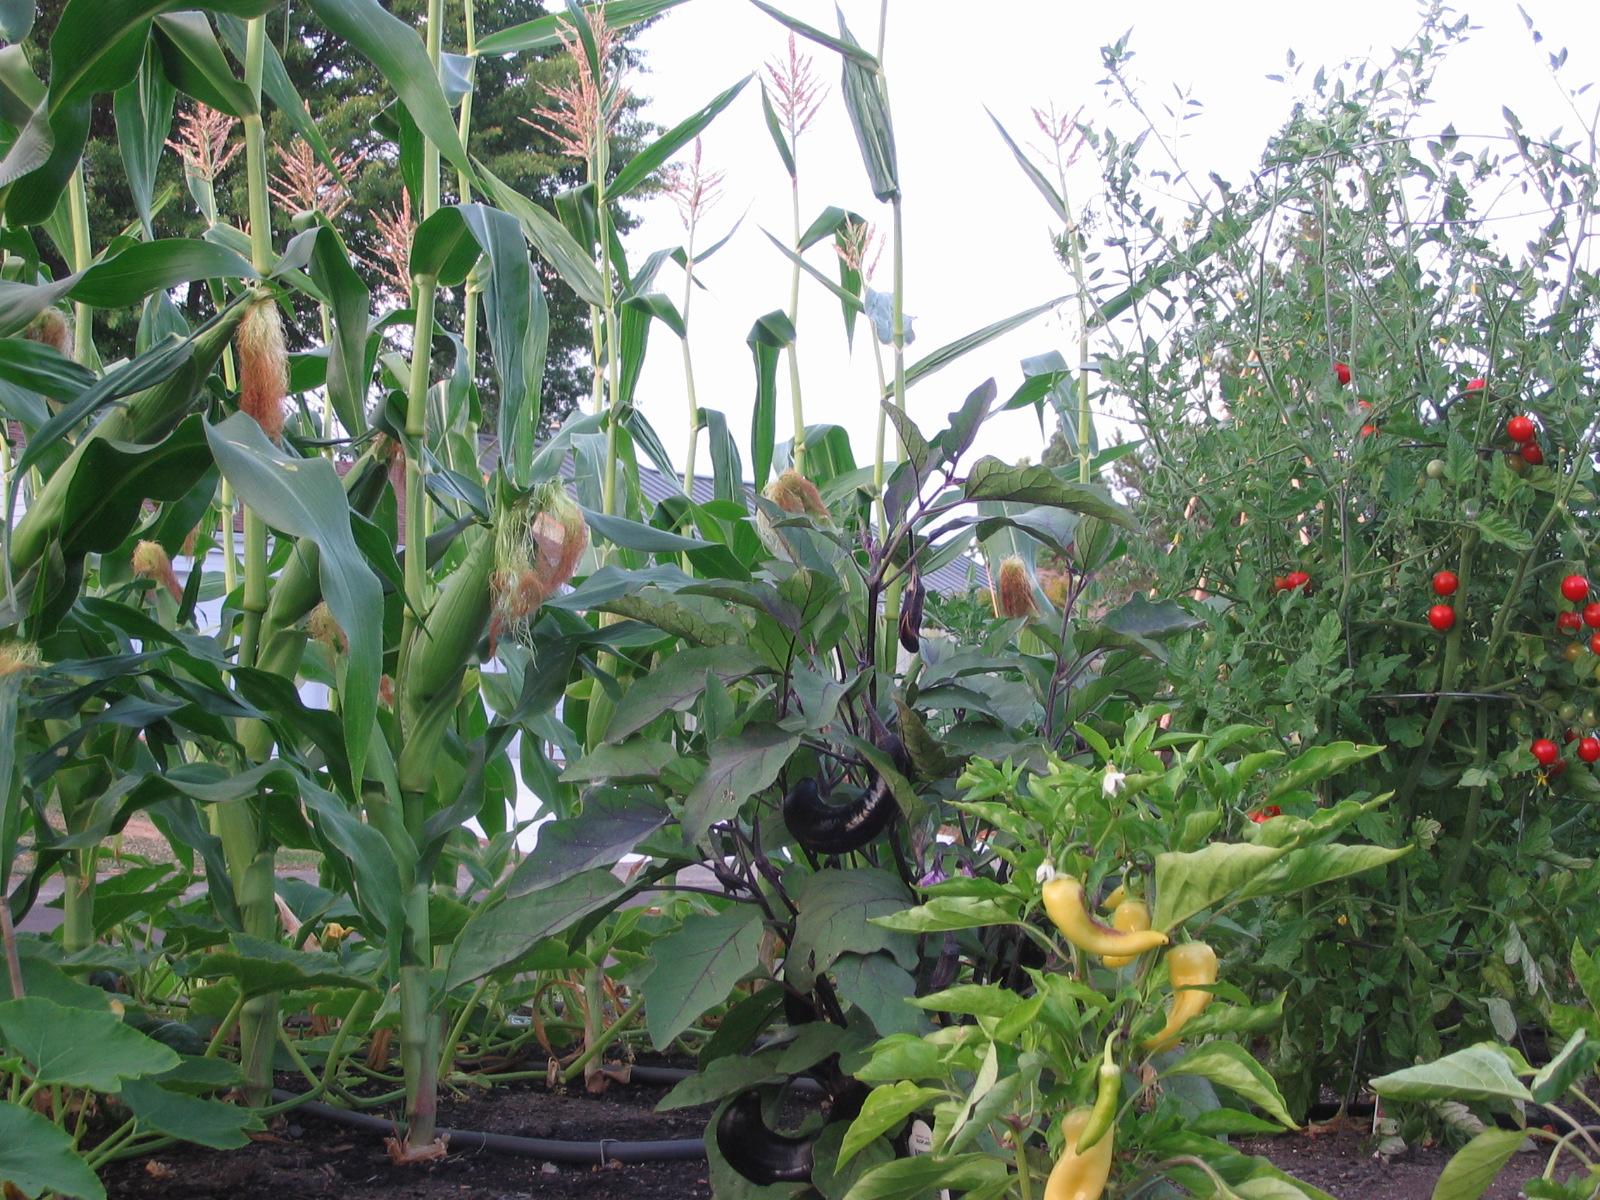 Colorful bounty: corn, eggplant, banana sweet pepper, cherry tomato